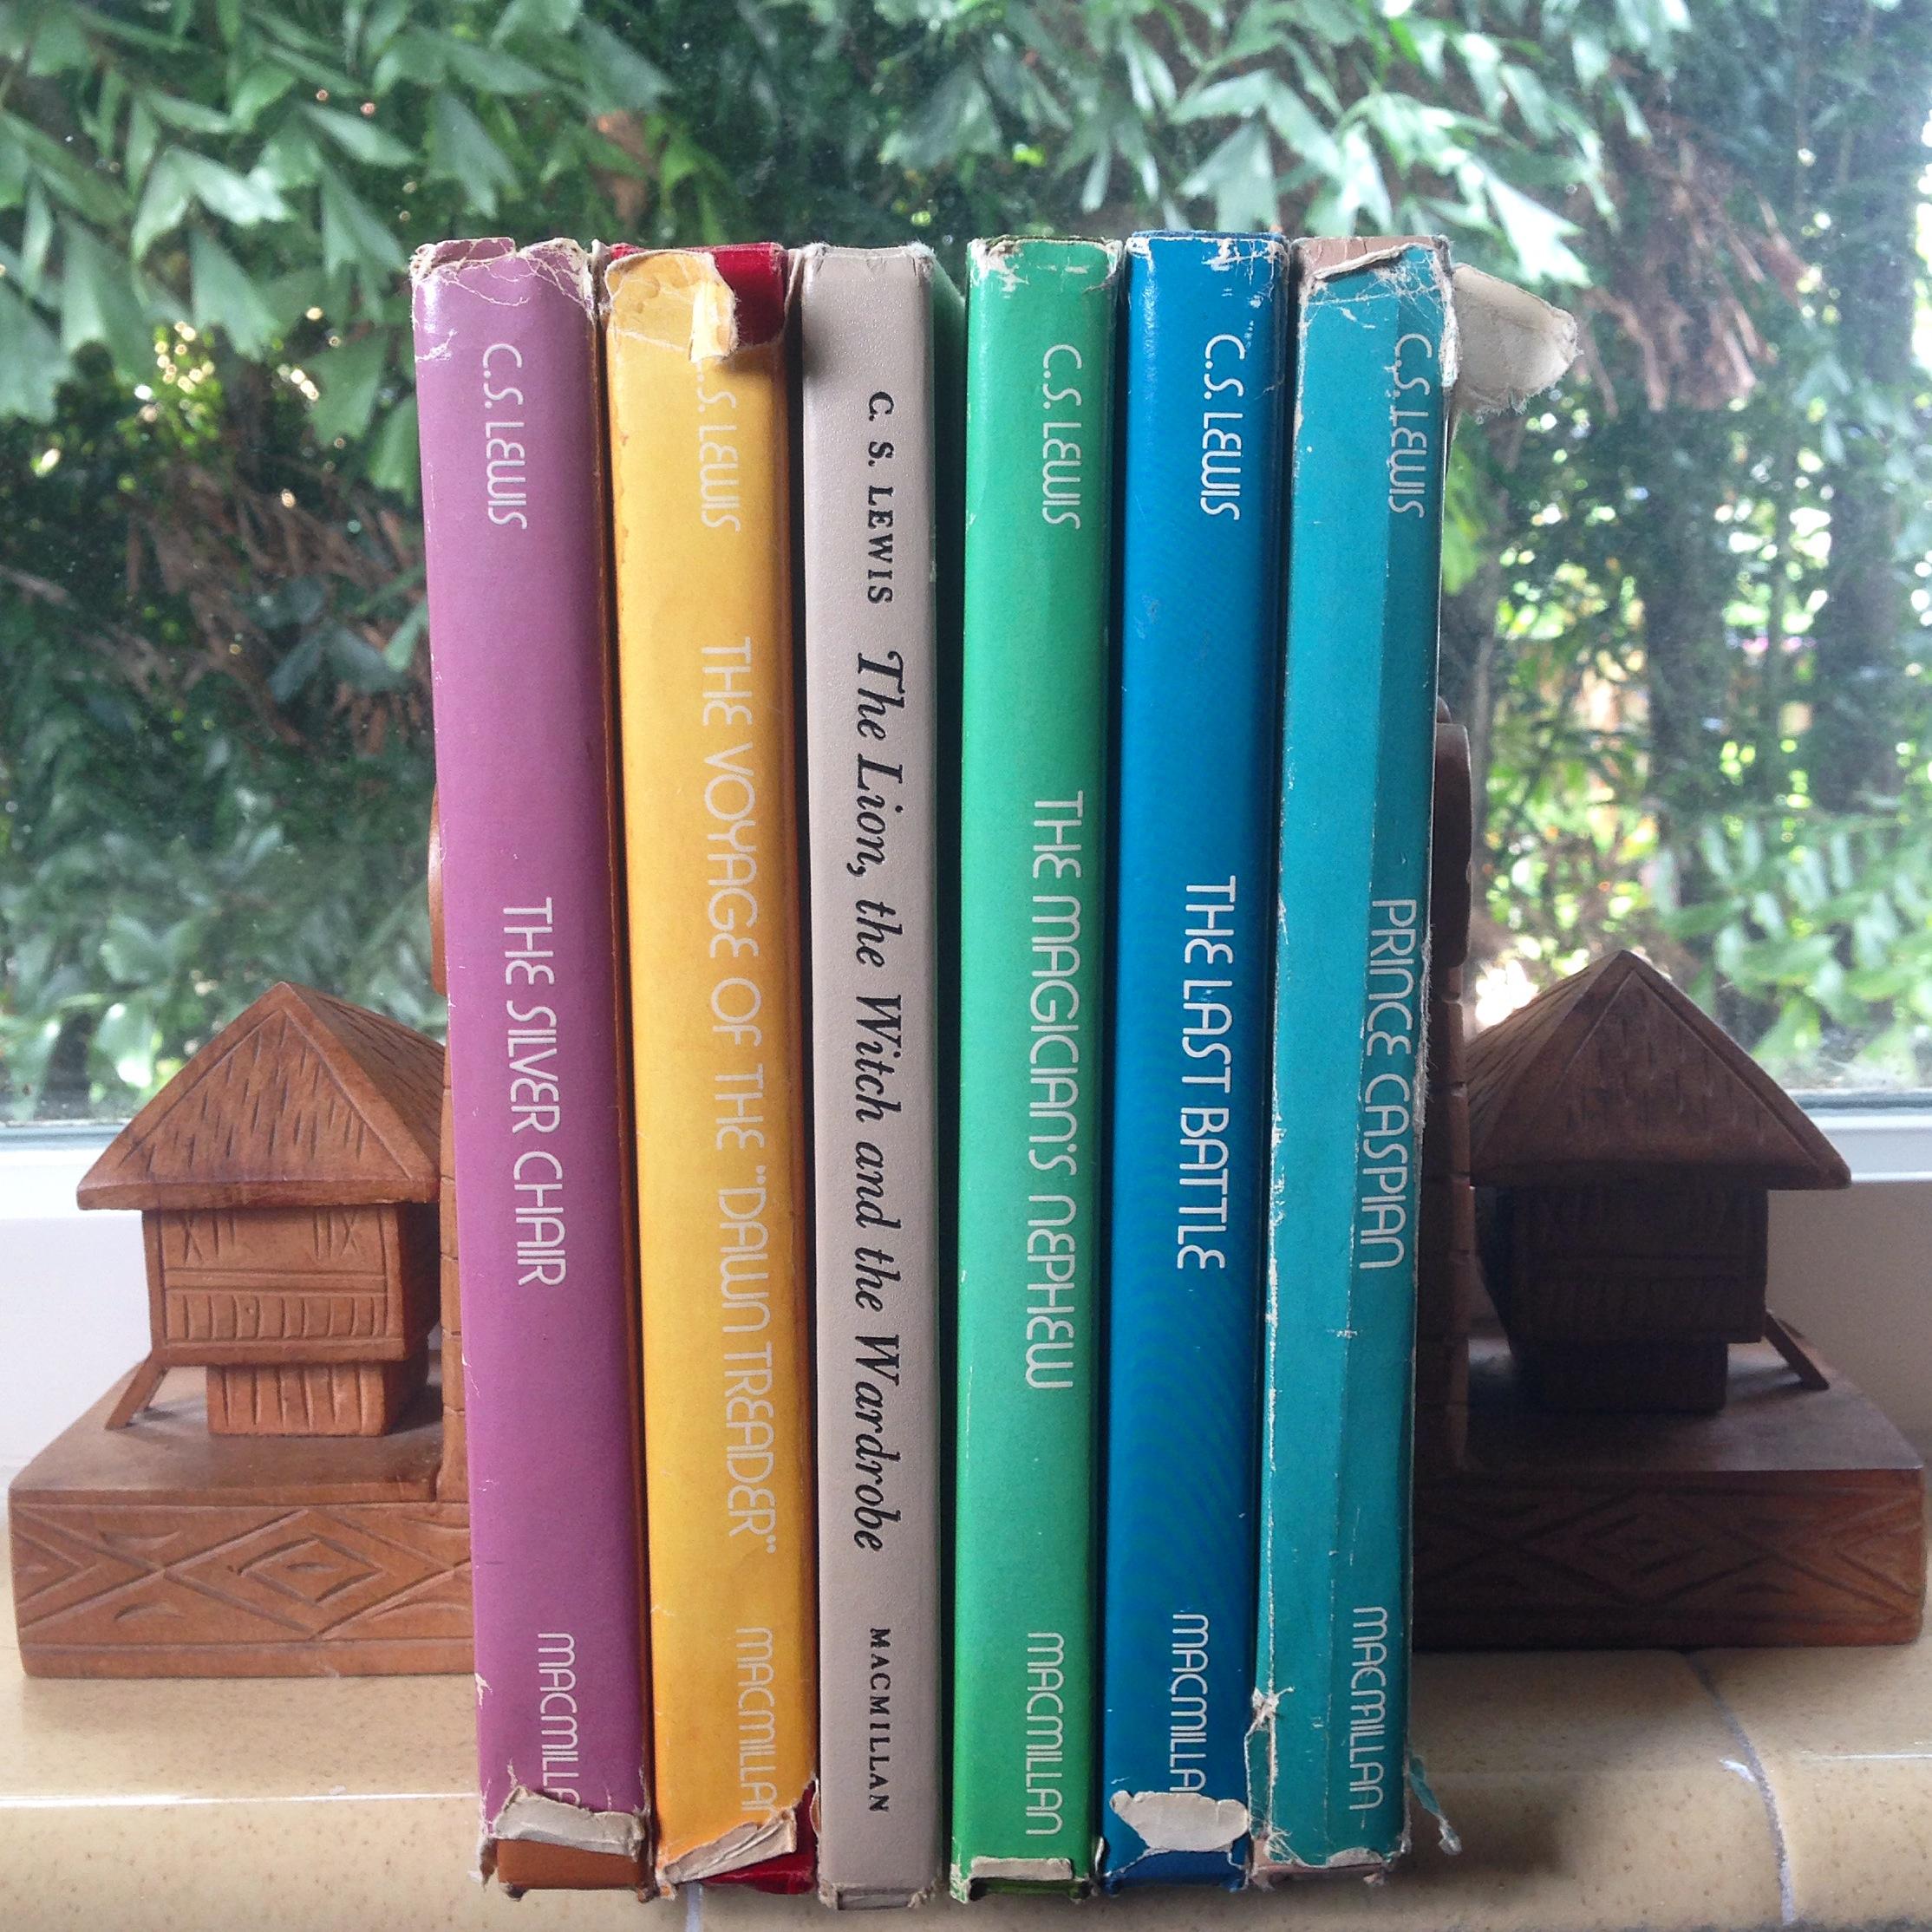 Day 17 - Bookshelf